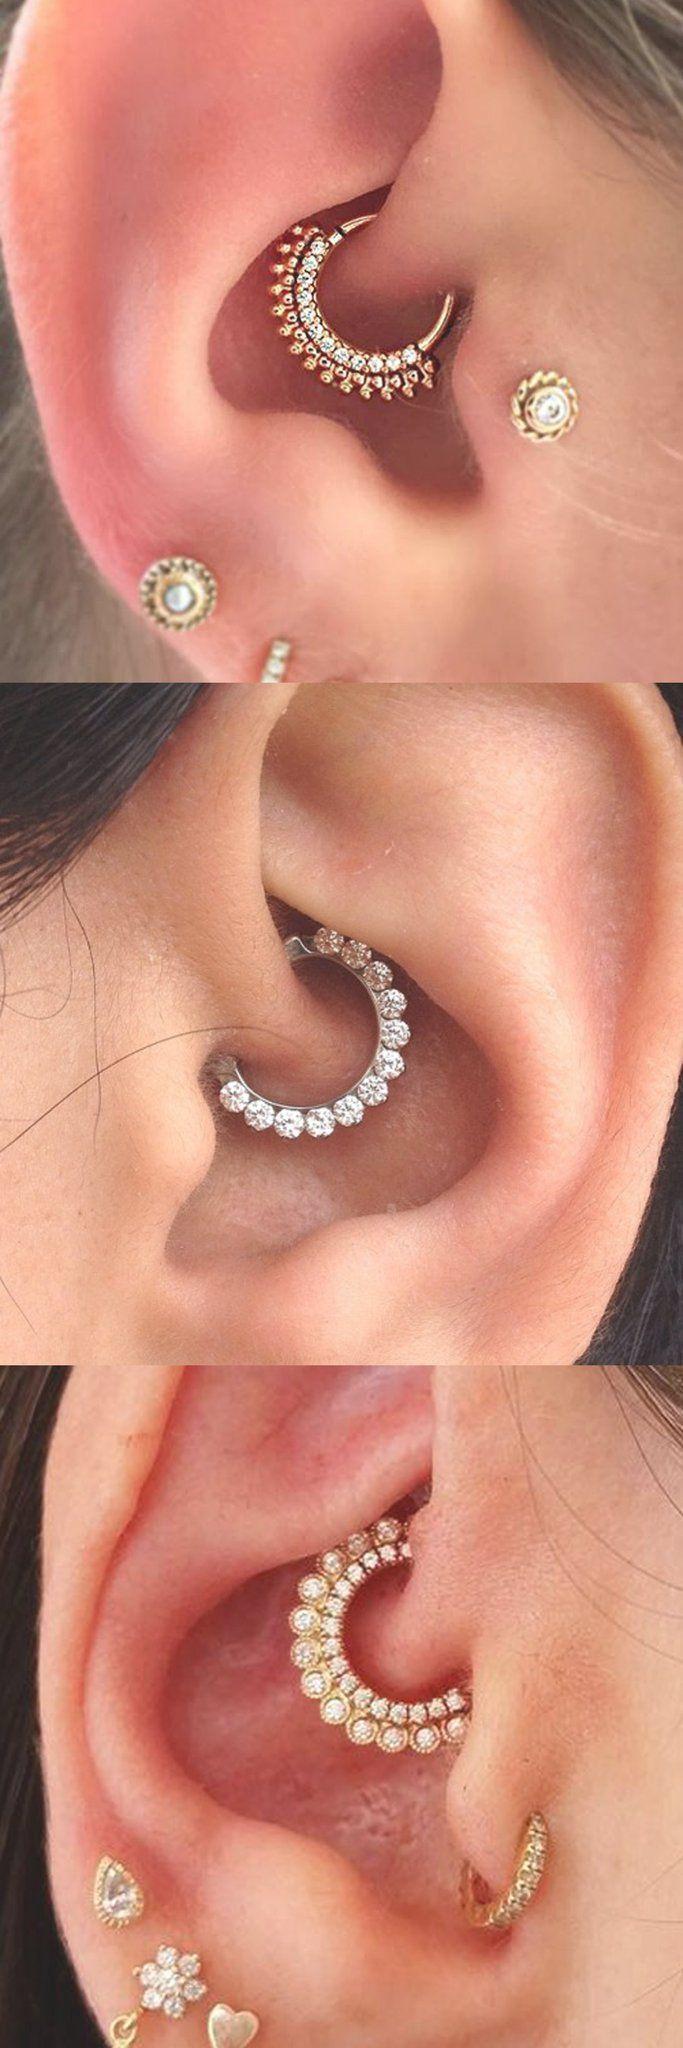 2017 Trendy Ear Piercing Ideas at MyBodiArt.com - Daith Piercing Jewelry Earring Gold Silver 16G - Tragus Stud #ad